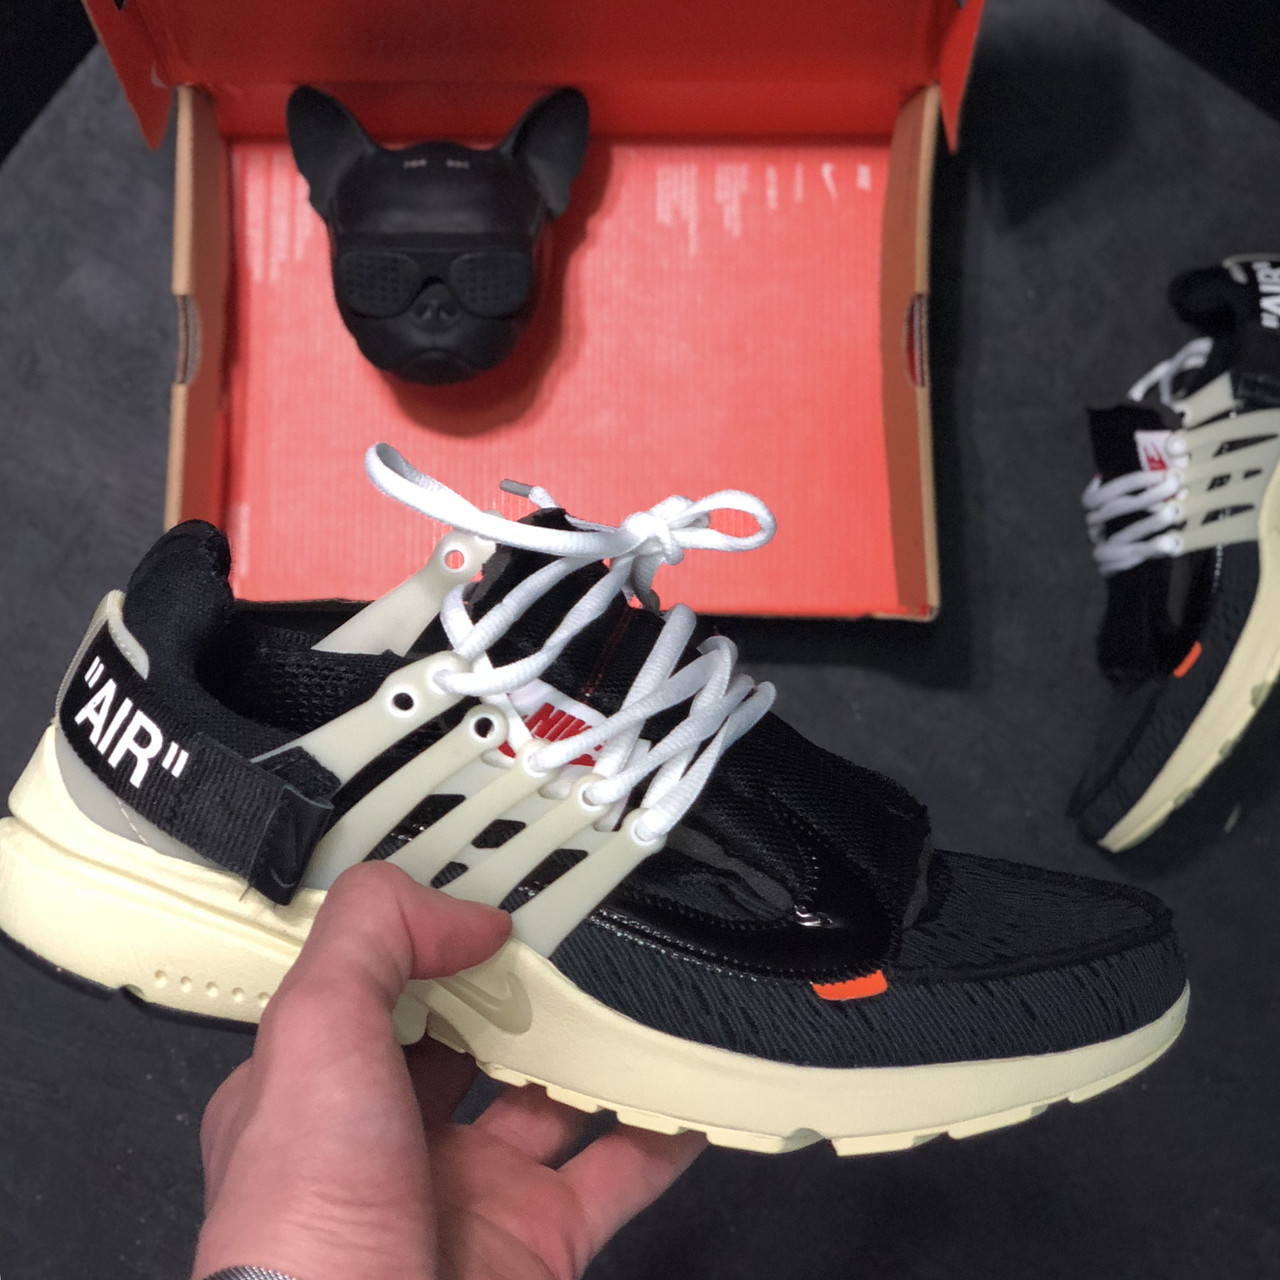 Мужские кроссовки Nike Air Presto Off white, чёрно-белые. Размеры (41,44,45)